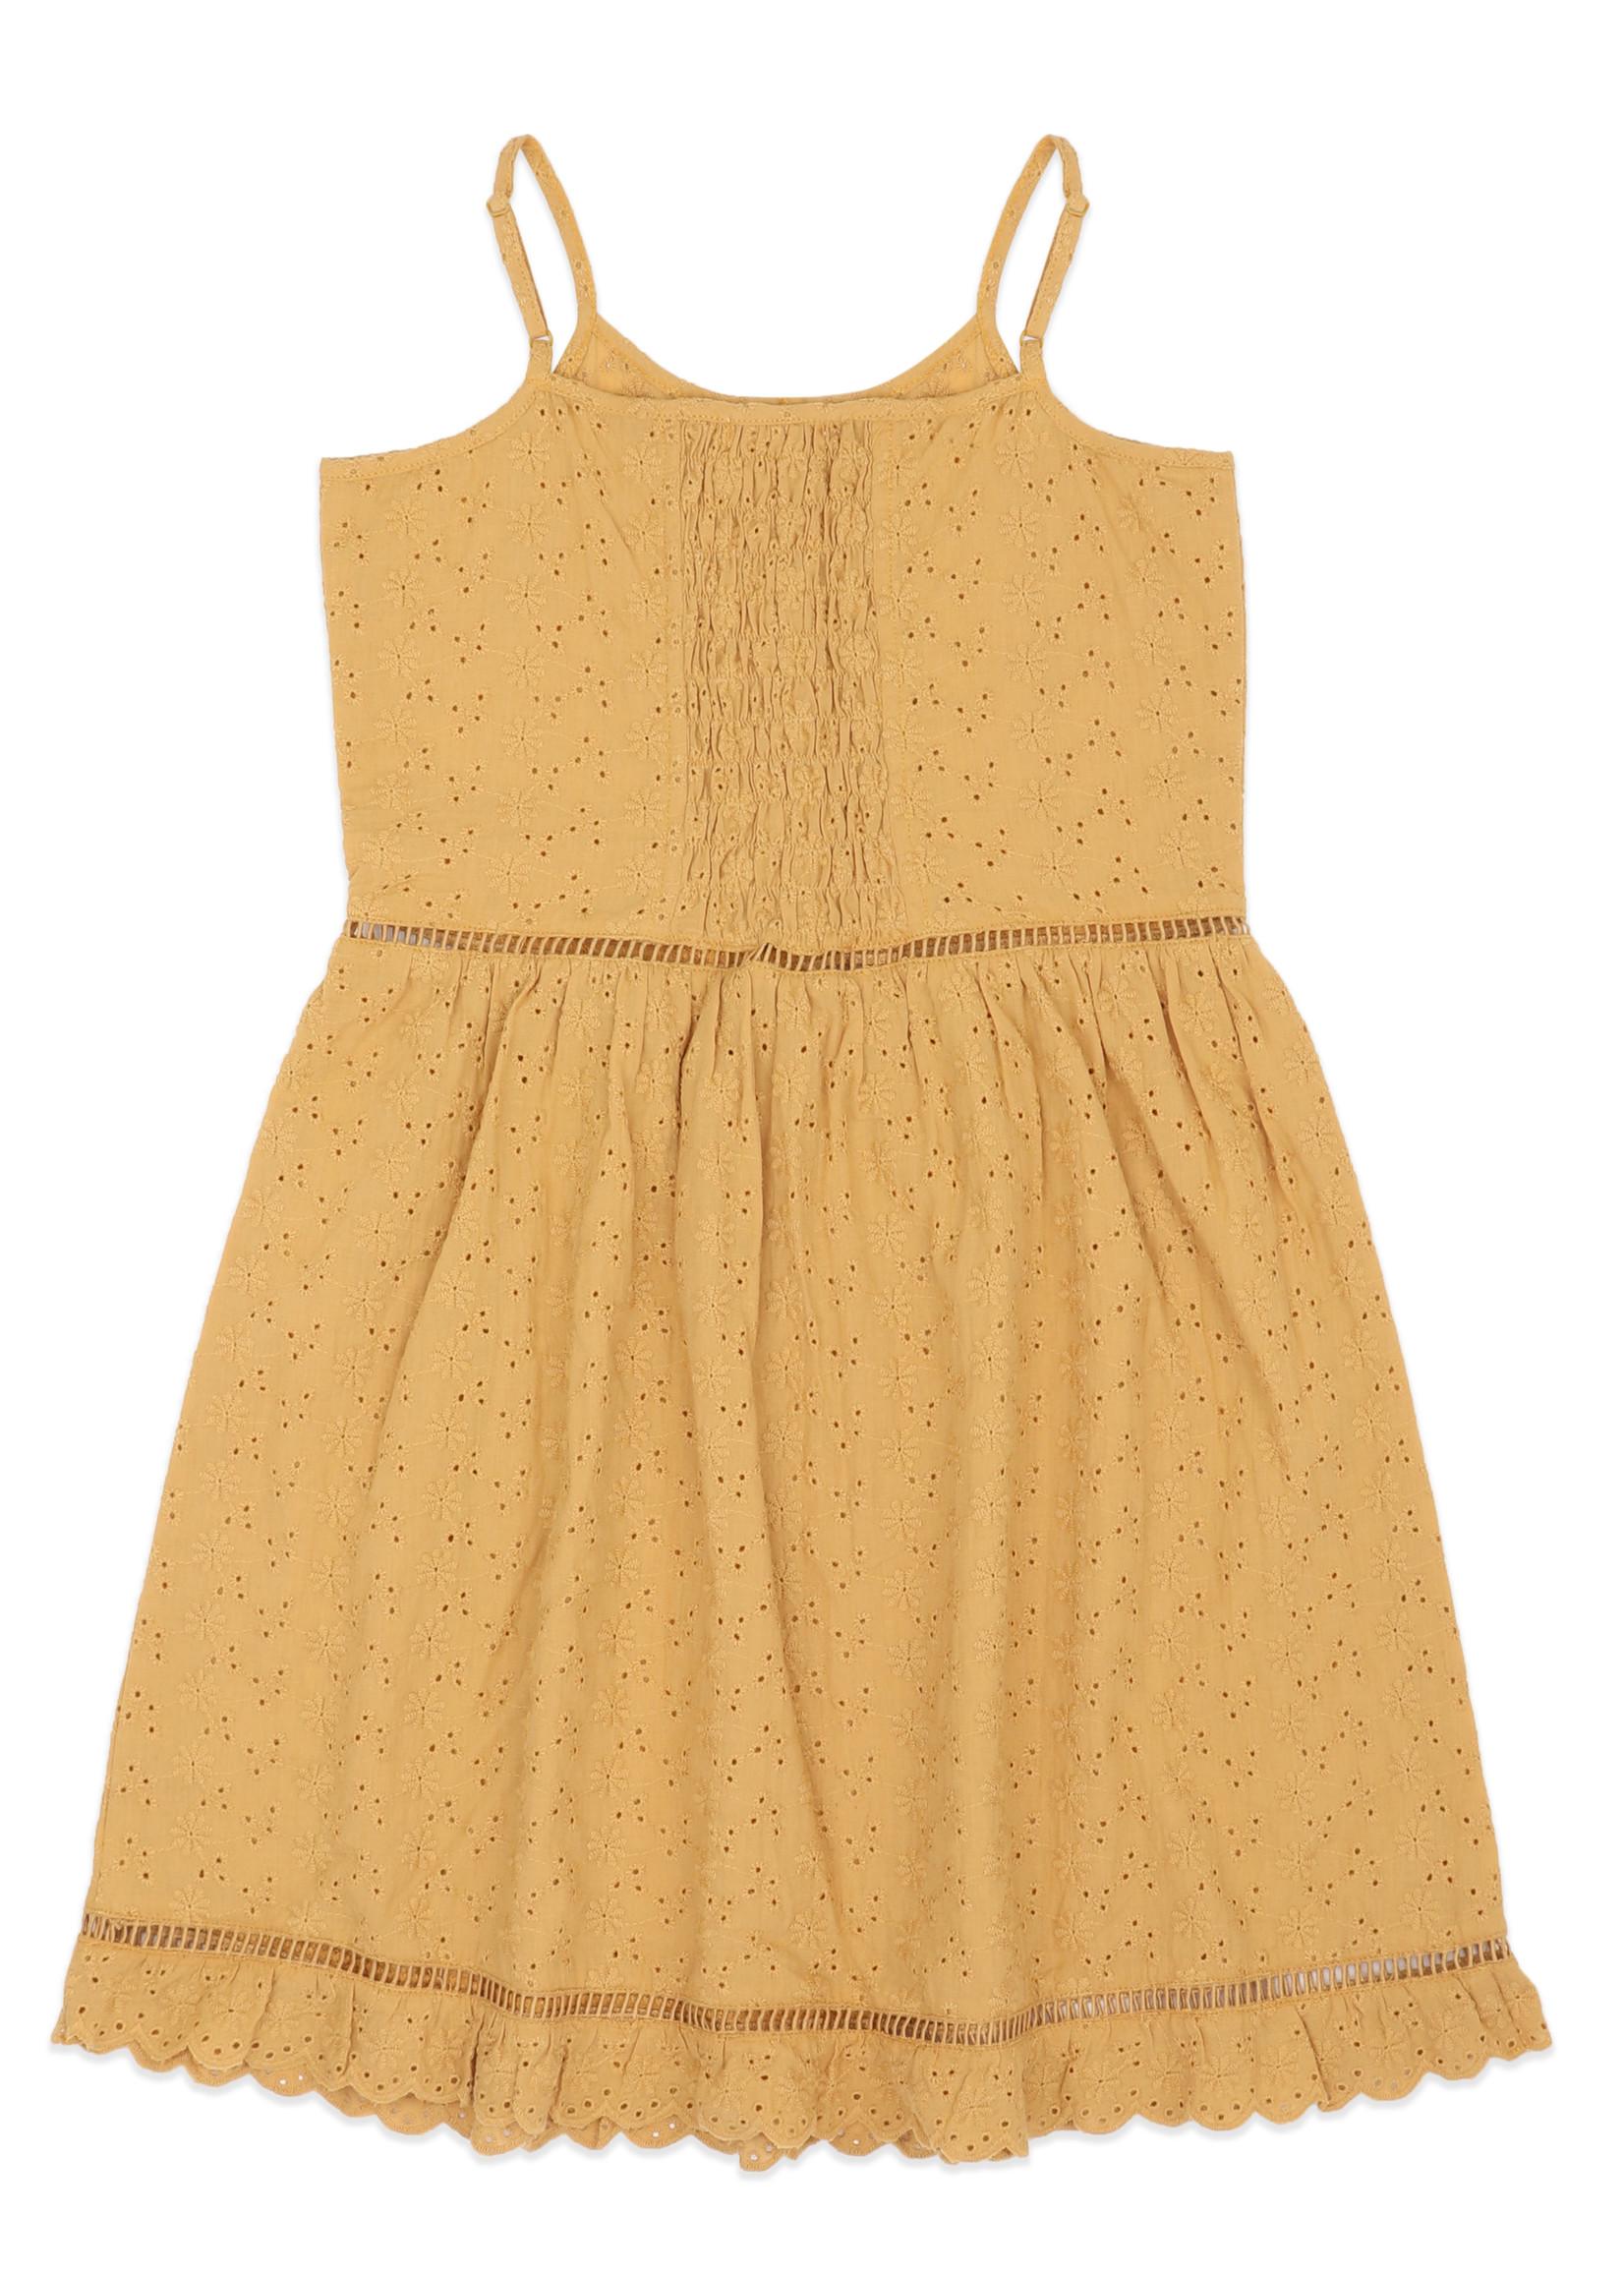 Ammehoela AM-Lenna-01-Mustard-Yellow